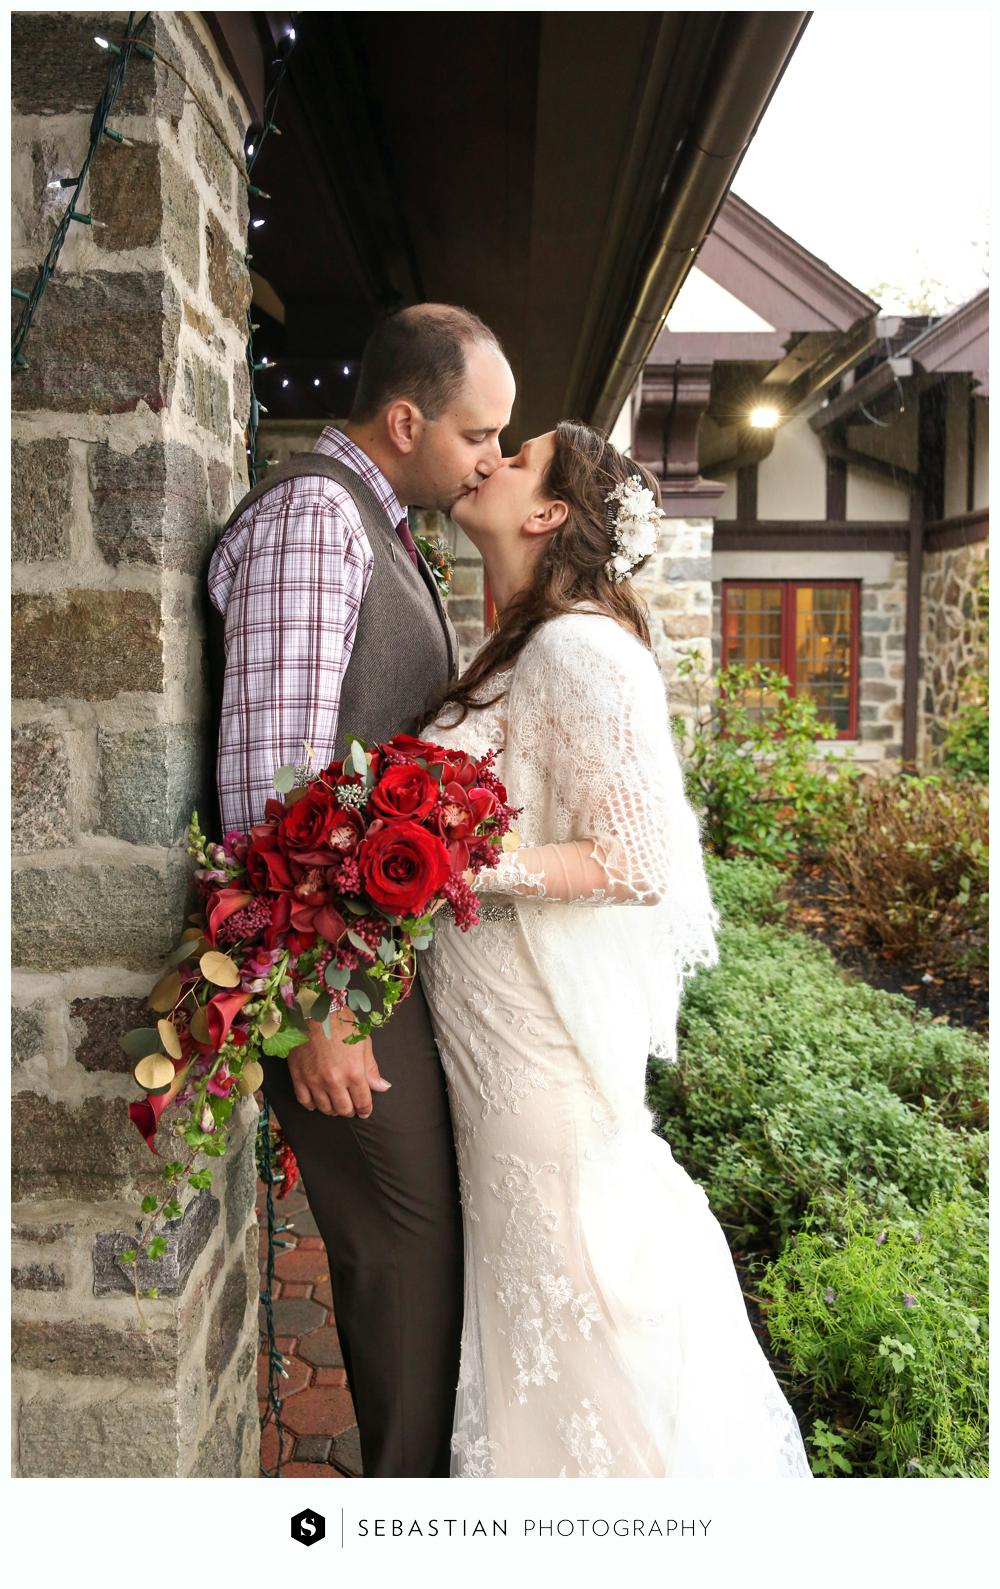 Sebastian Photography_CT Wedding Photographer_St Clements Castle_1037.jpg